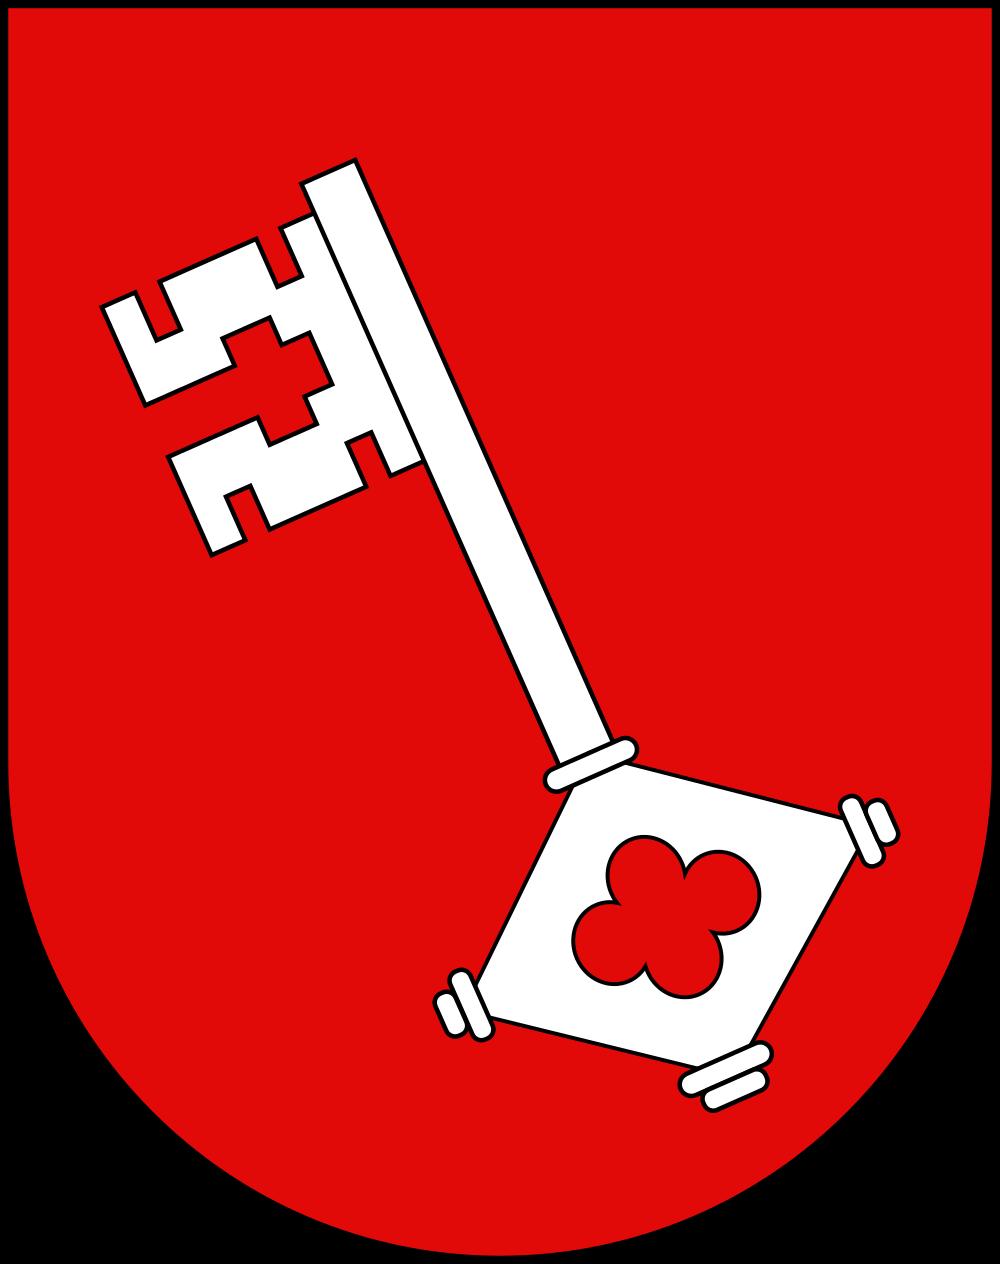 File:Klausen Suedtirol CoA.svg.